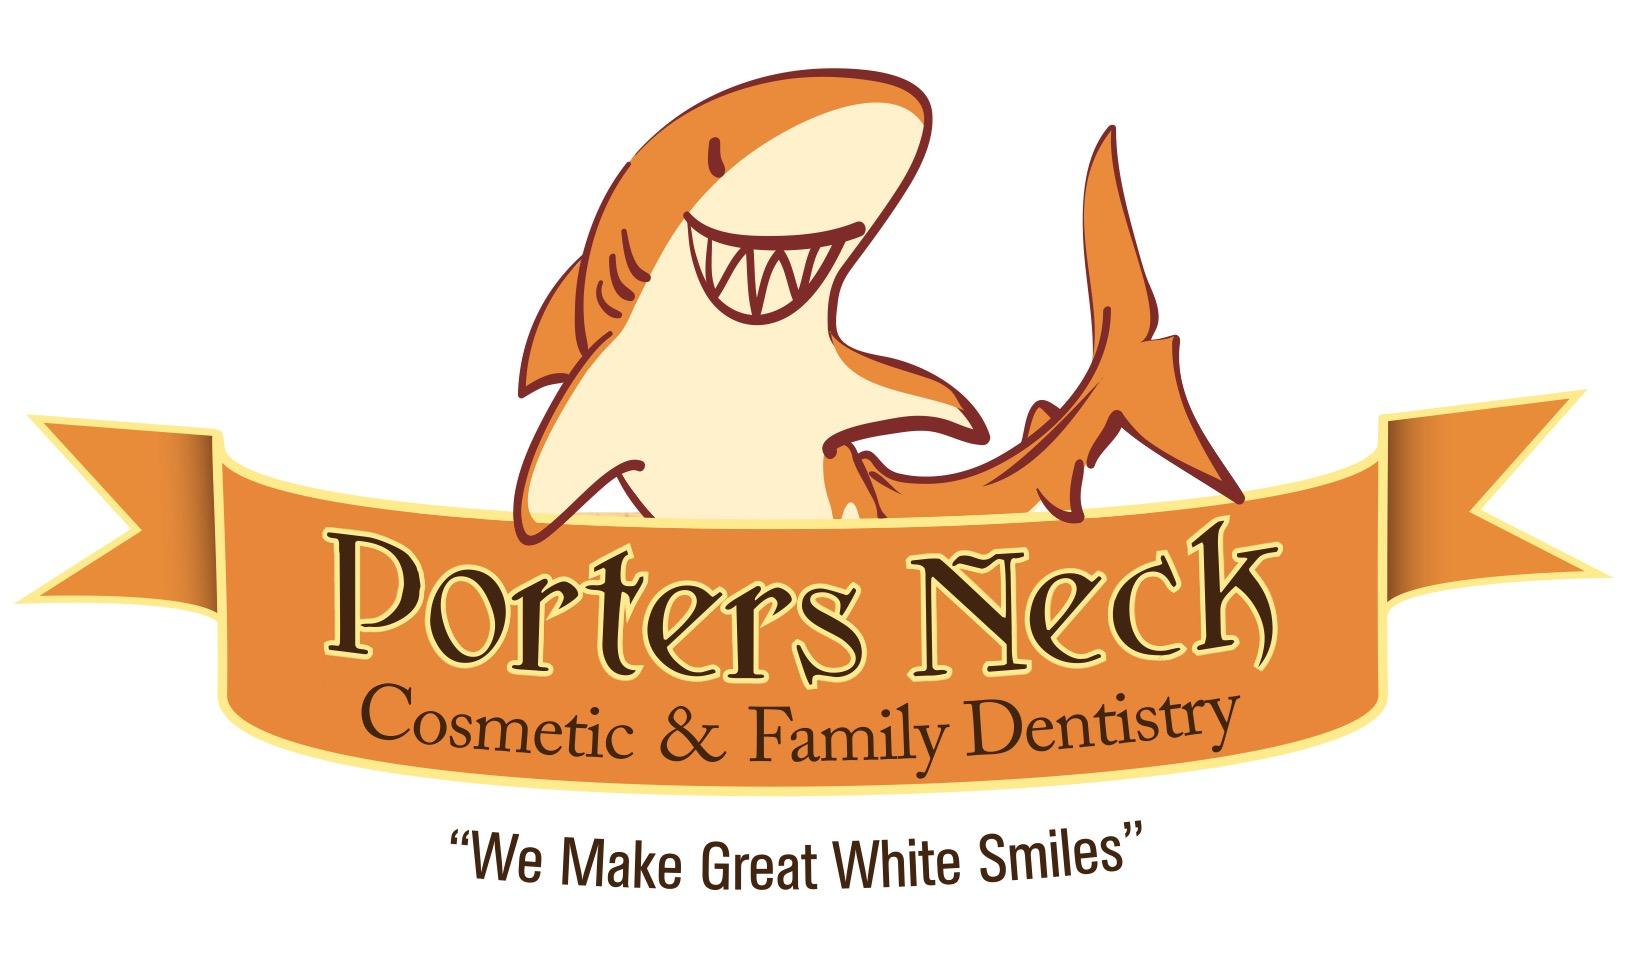 Porters Neck Dentistry